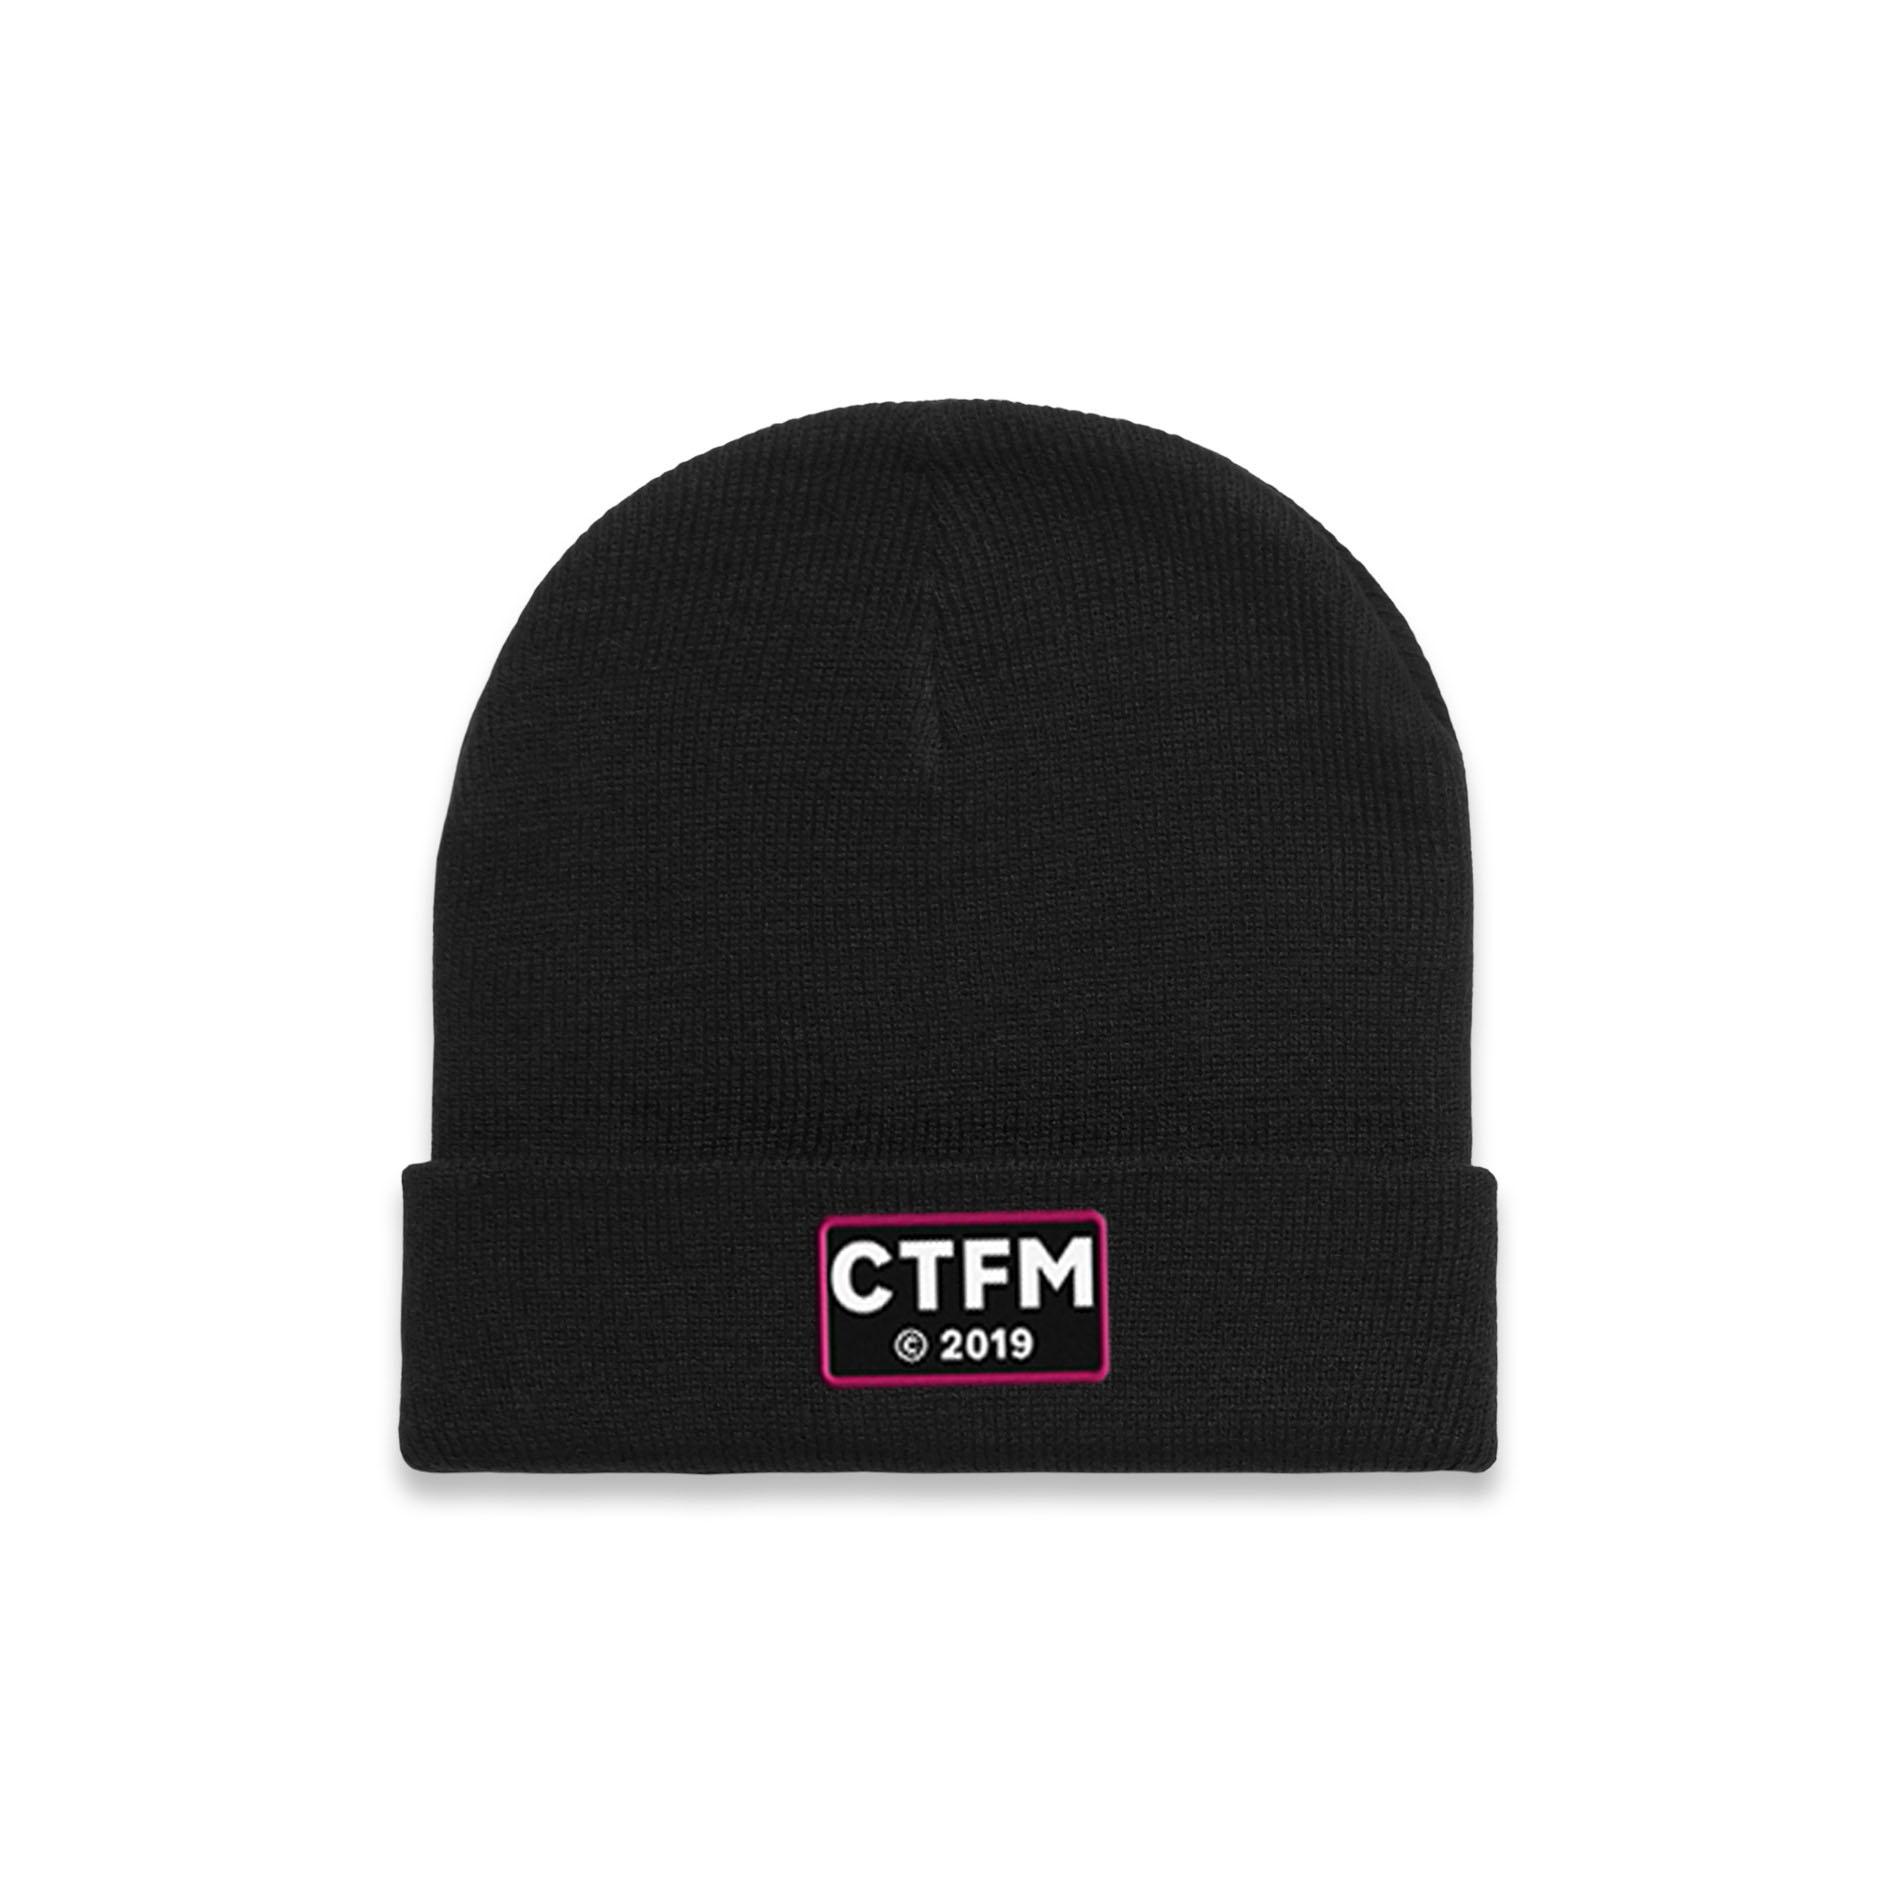 CTFM BEANIE.jpg